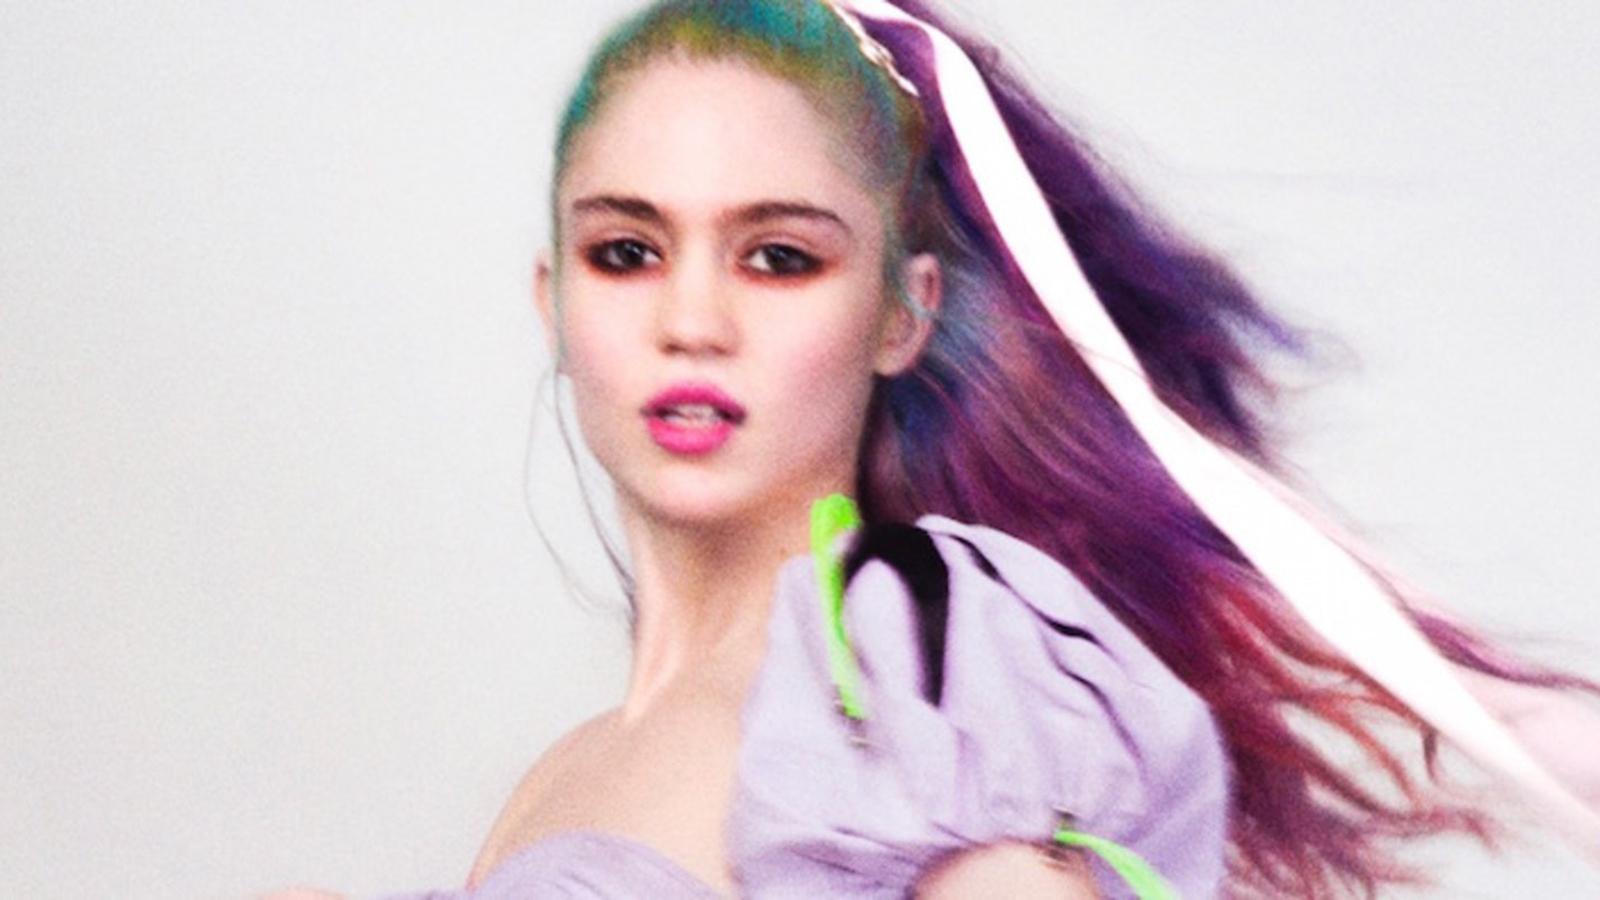 Hear Industrial Dance Meet Goth Pop On Grimes' New